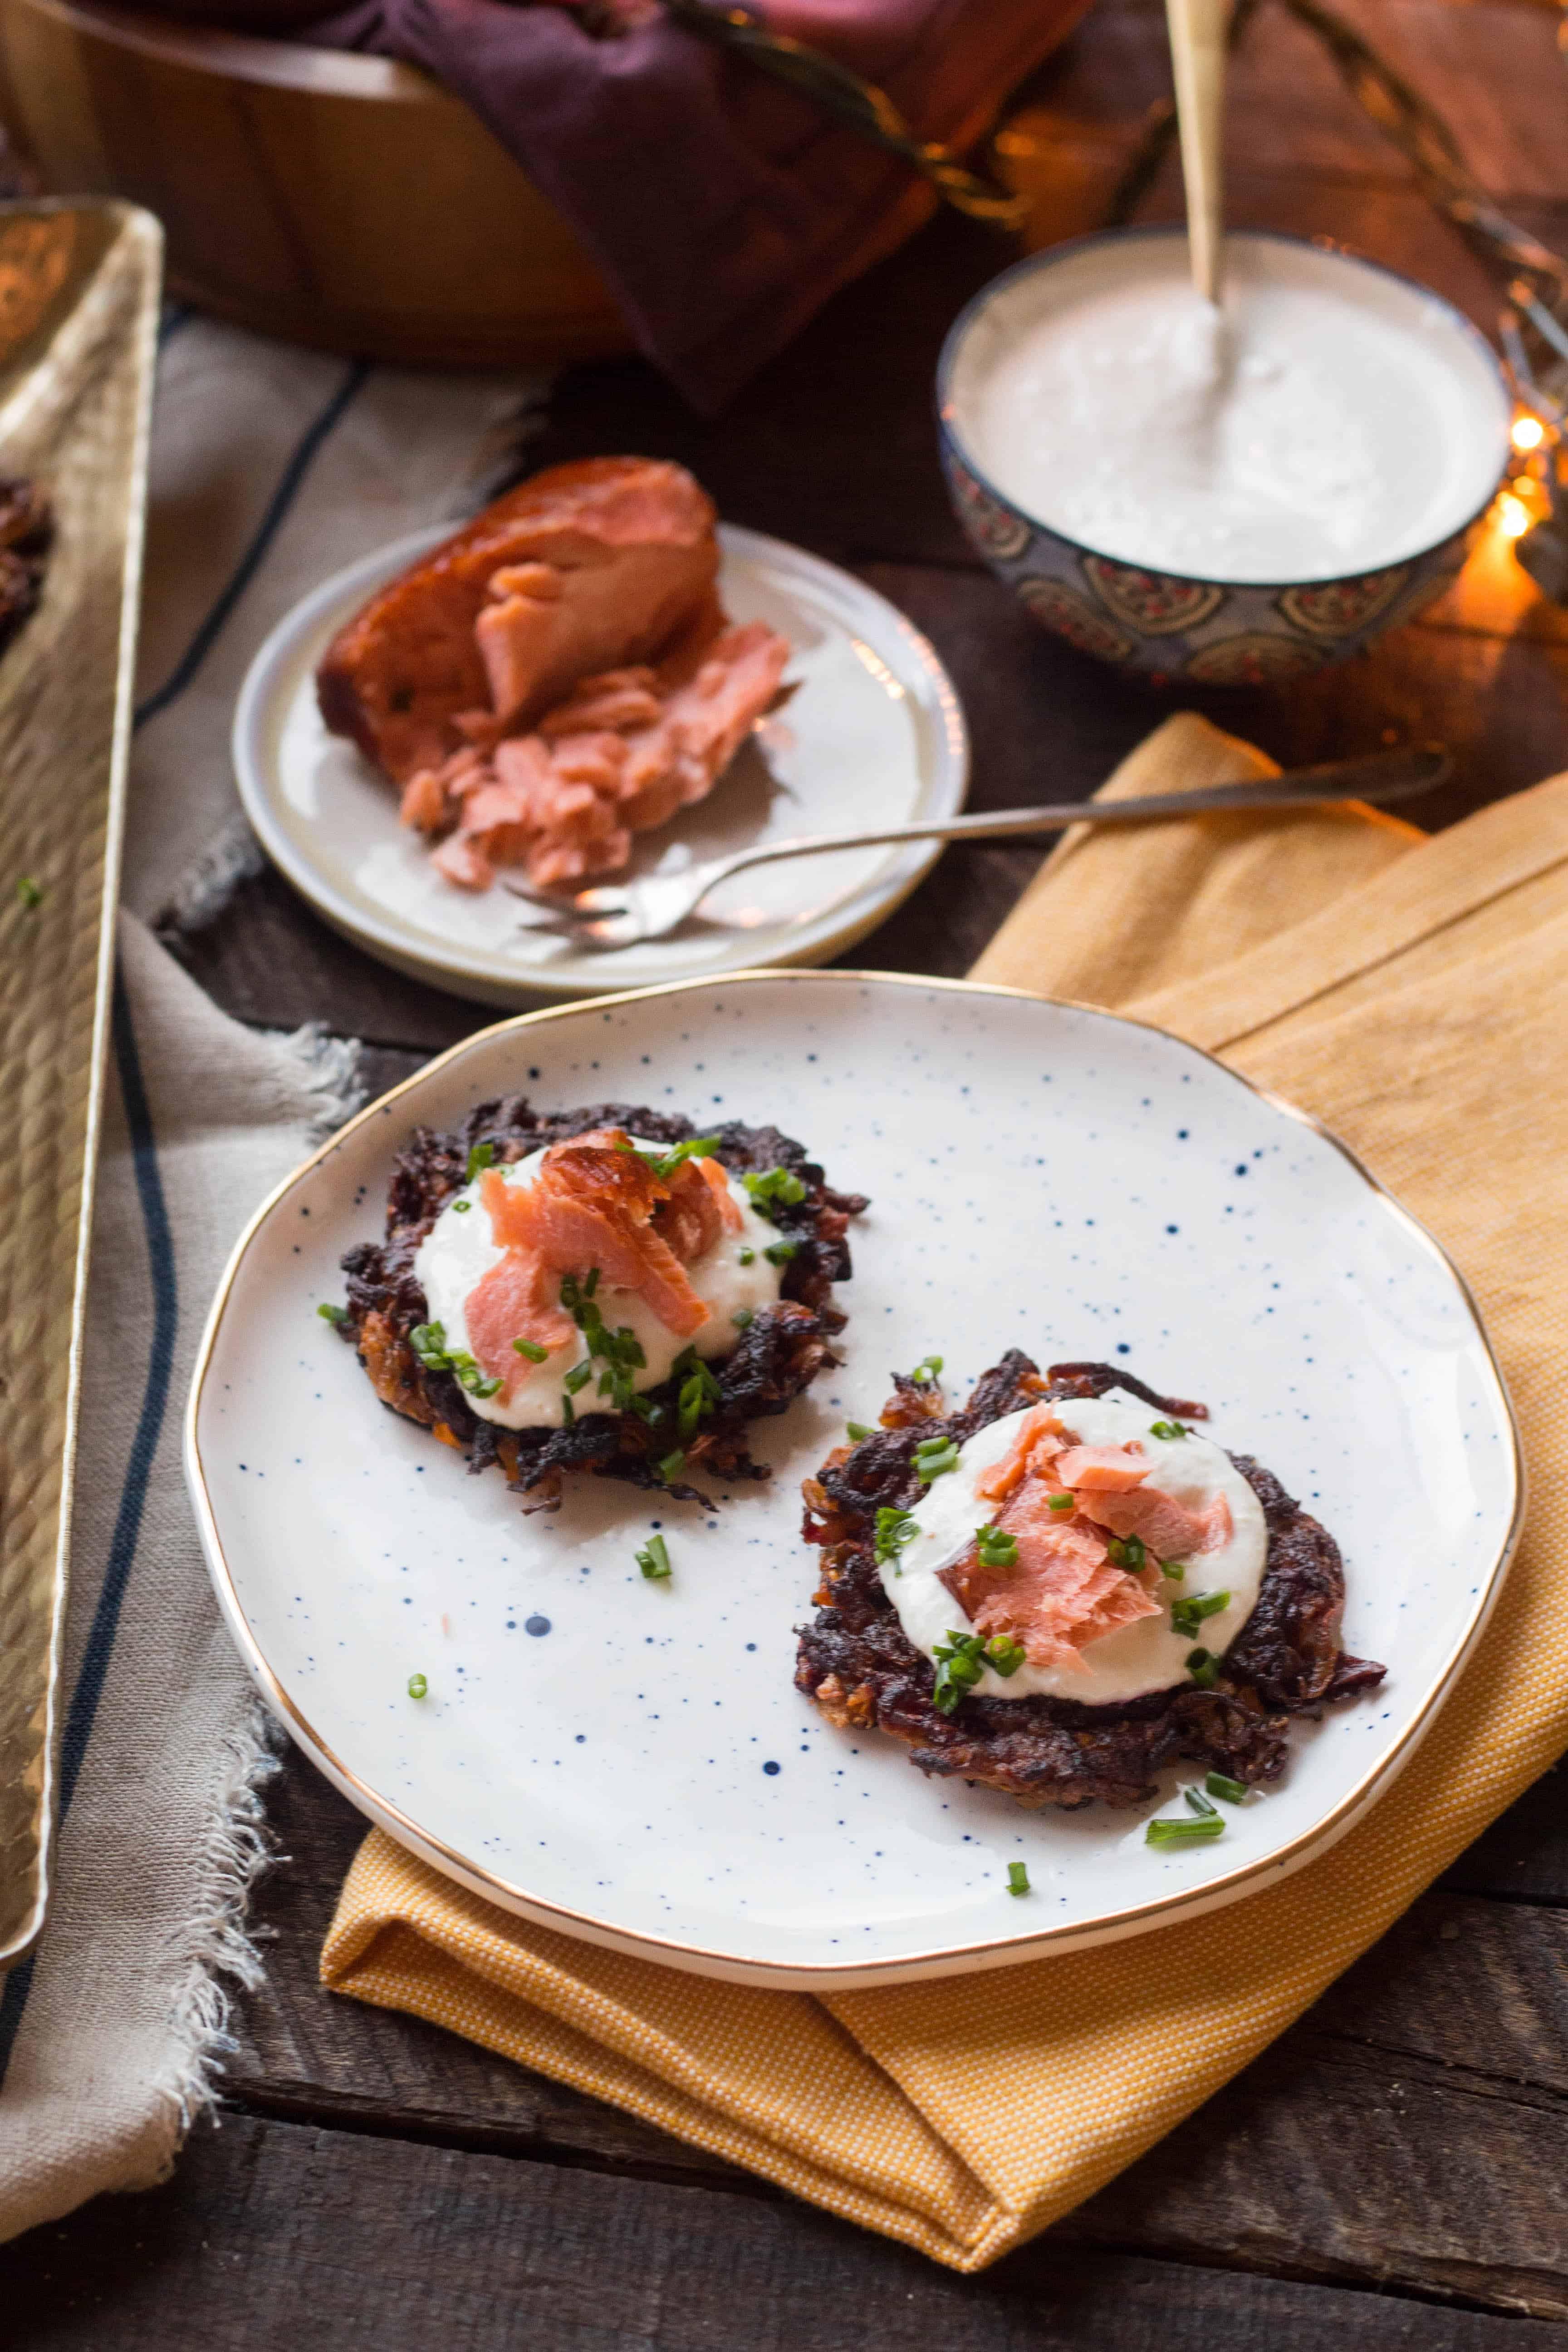 Beet + Carrot Latkes with Smoked Salmon + Horseradish Sour Cream